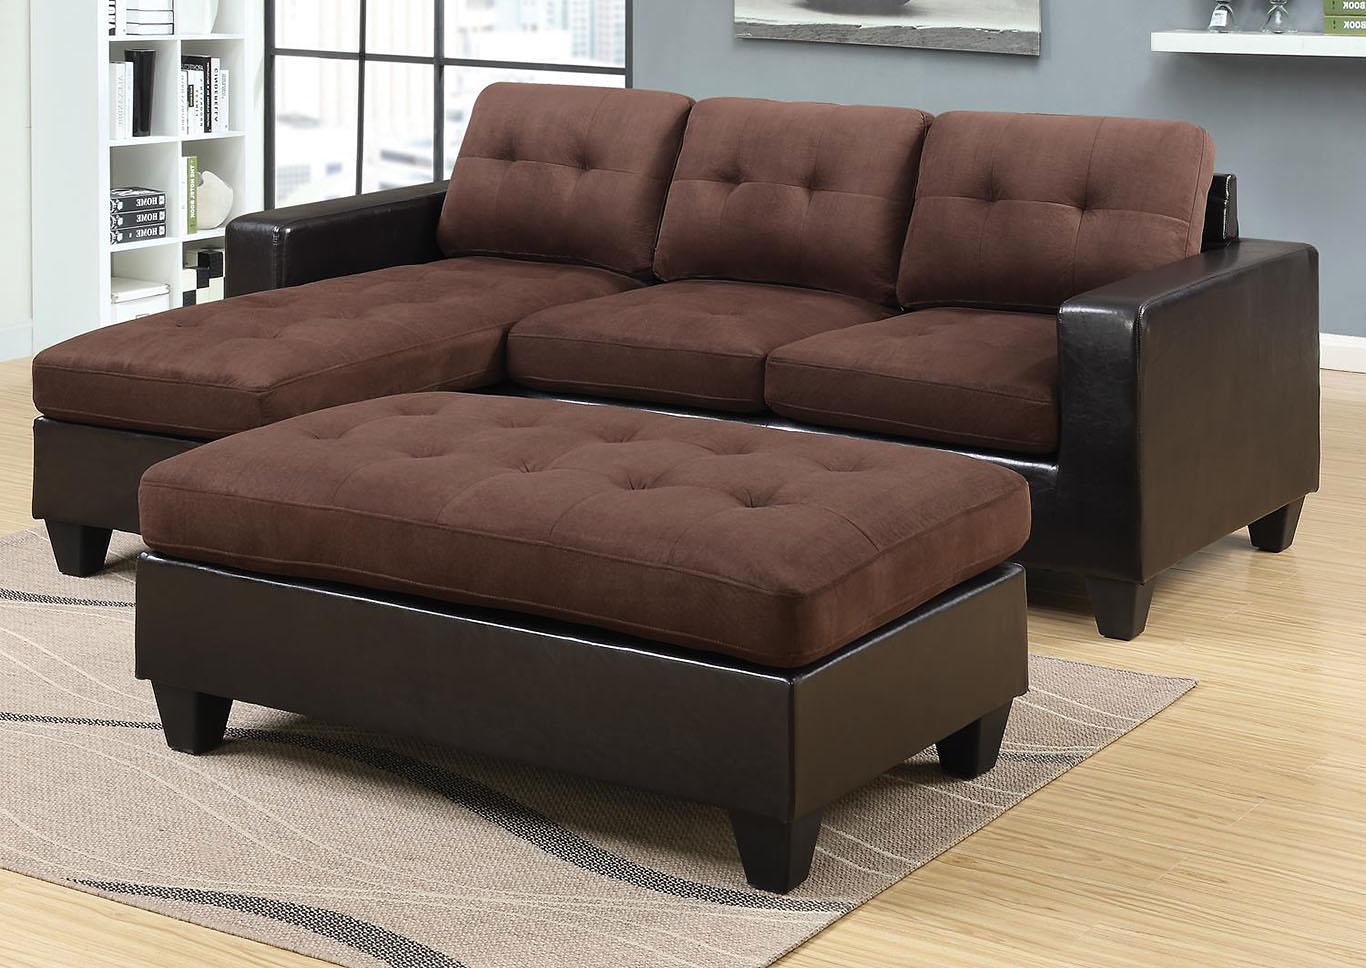 Fantastic Roses Flooring And Furniture Norwalk Brown Sofa W Ottoman Machost Co Dining Chair Design Ideas Machostcouk